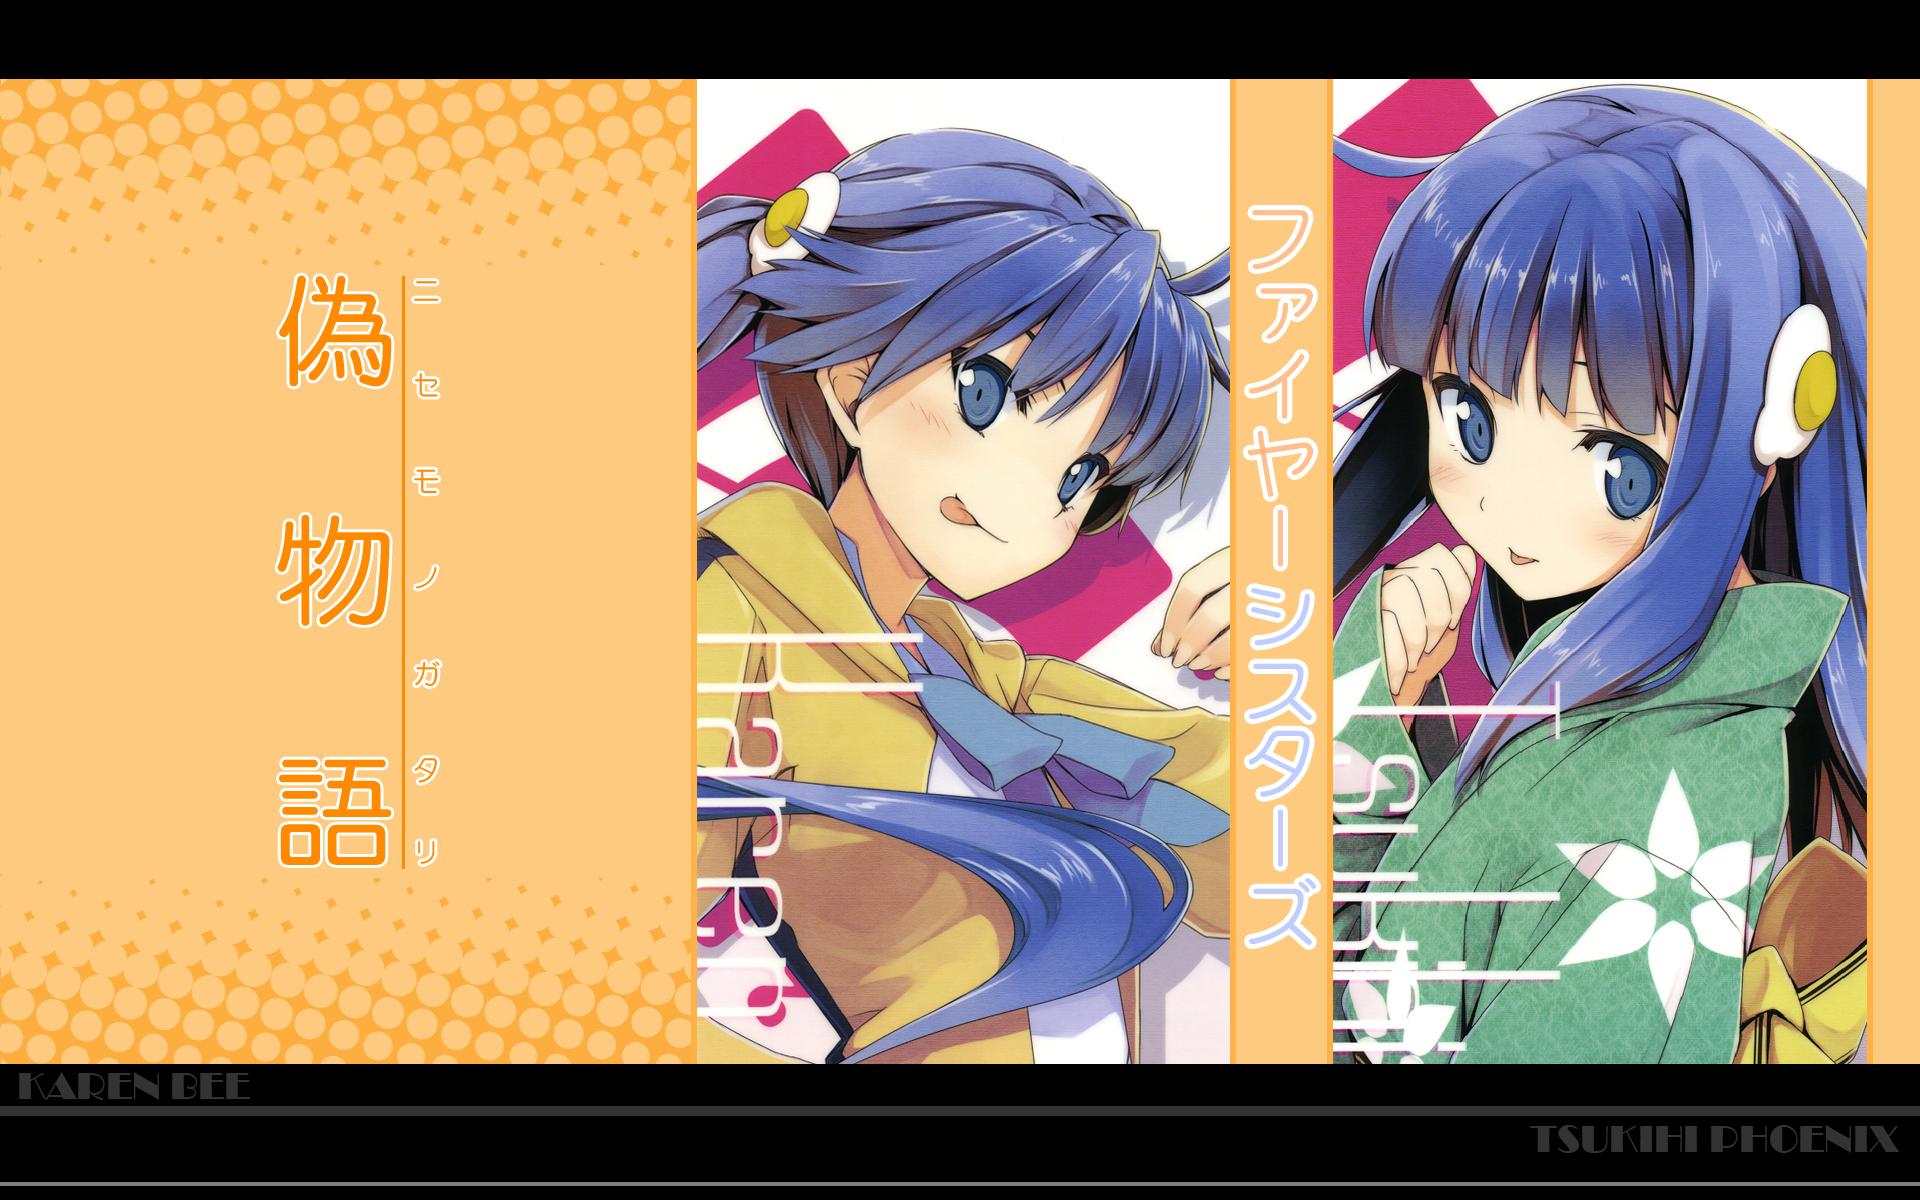 araragi_karen araragi_tsukihi bakemonogatari monogatari_(series)